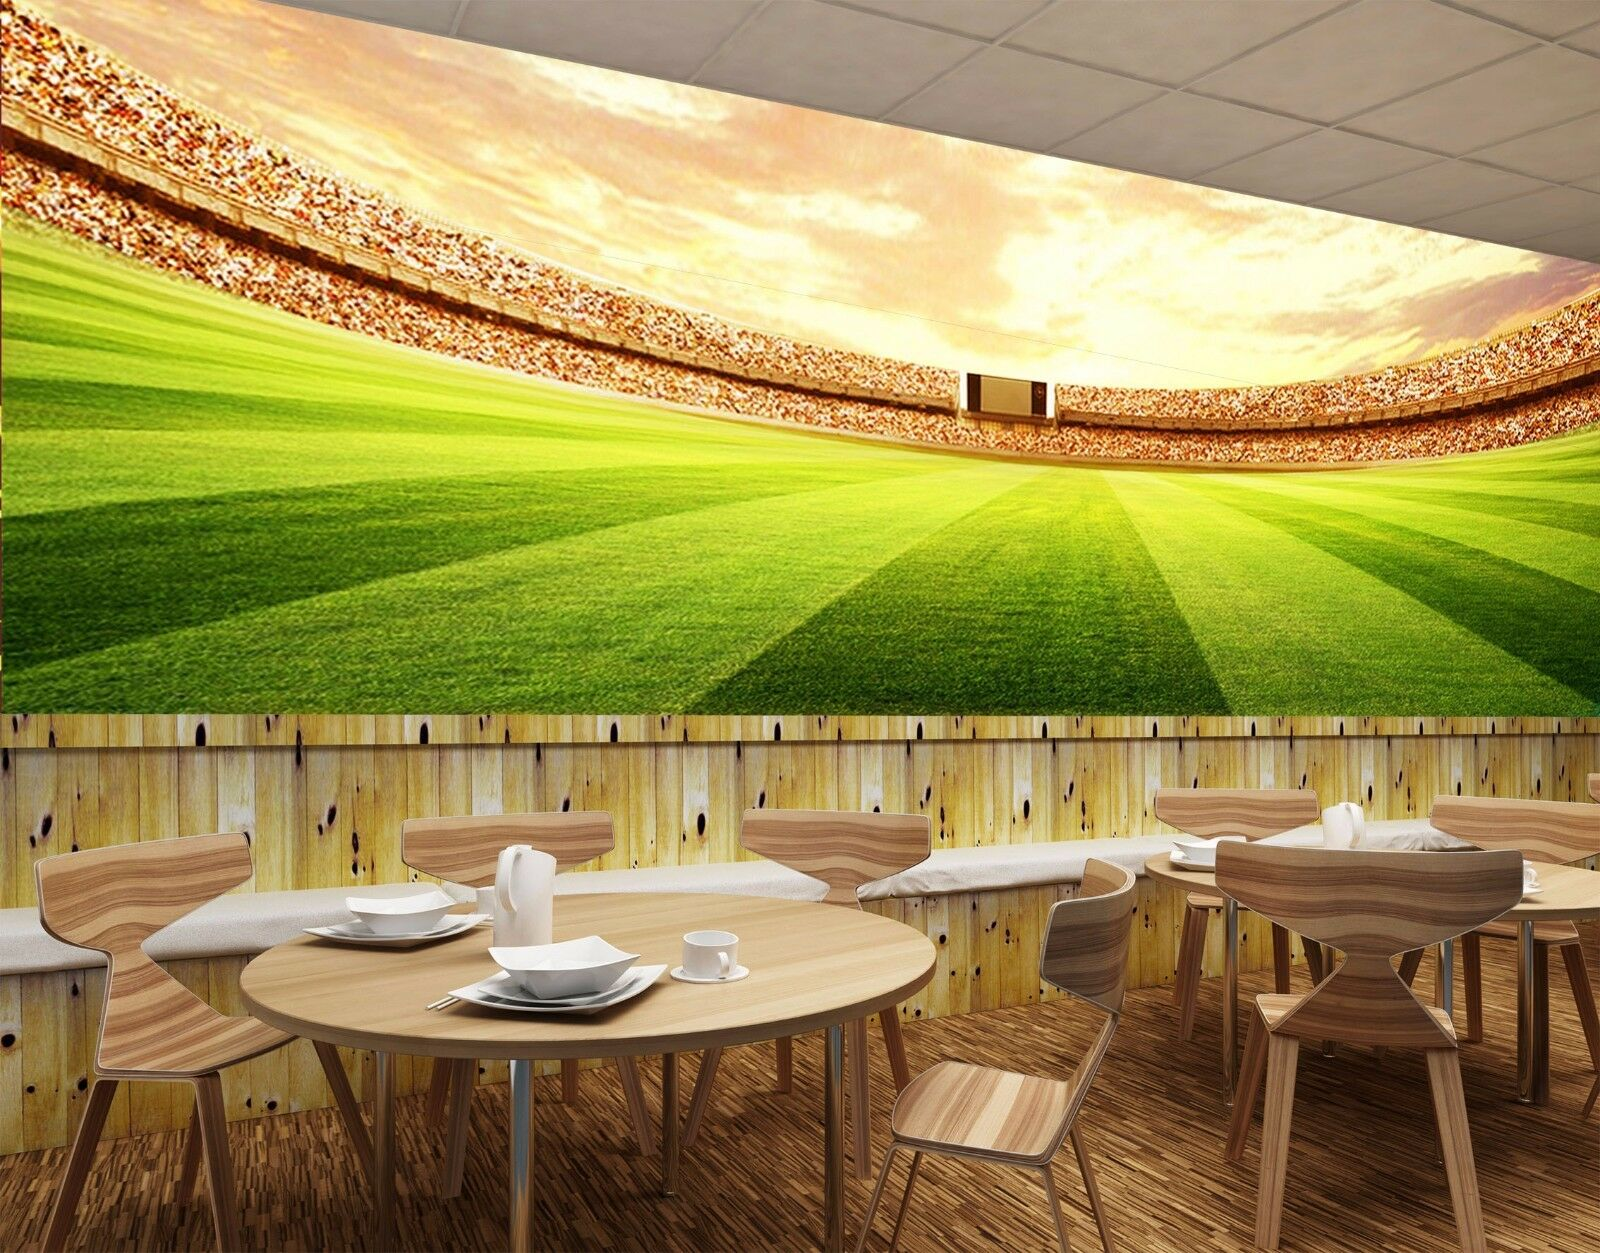 3D Large Stadium 498 WallPaper Murals Wall Print Decal Wall Deco AJ WALLPAPER